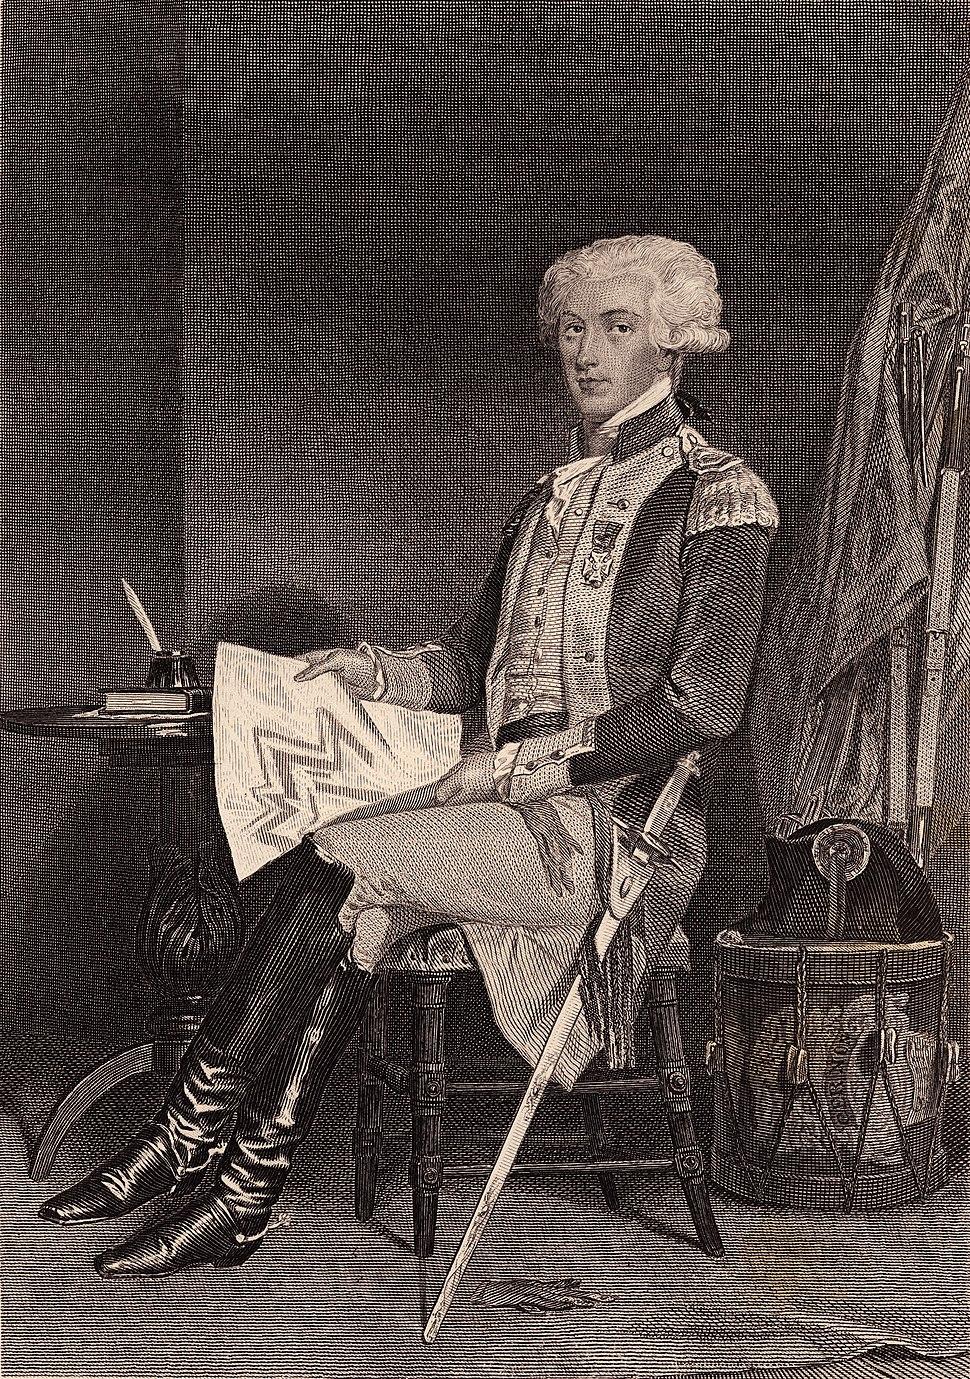 Lafayette, Marie Joseph Paul Yves Roch Gilbert Du Motier, marquis de